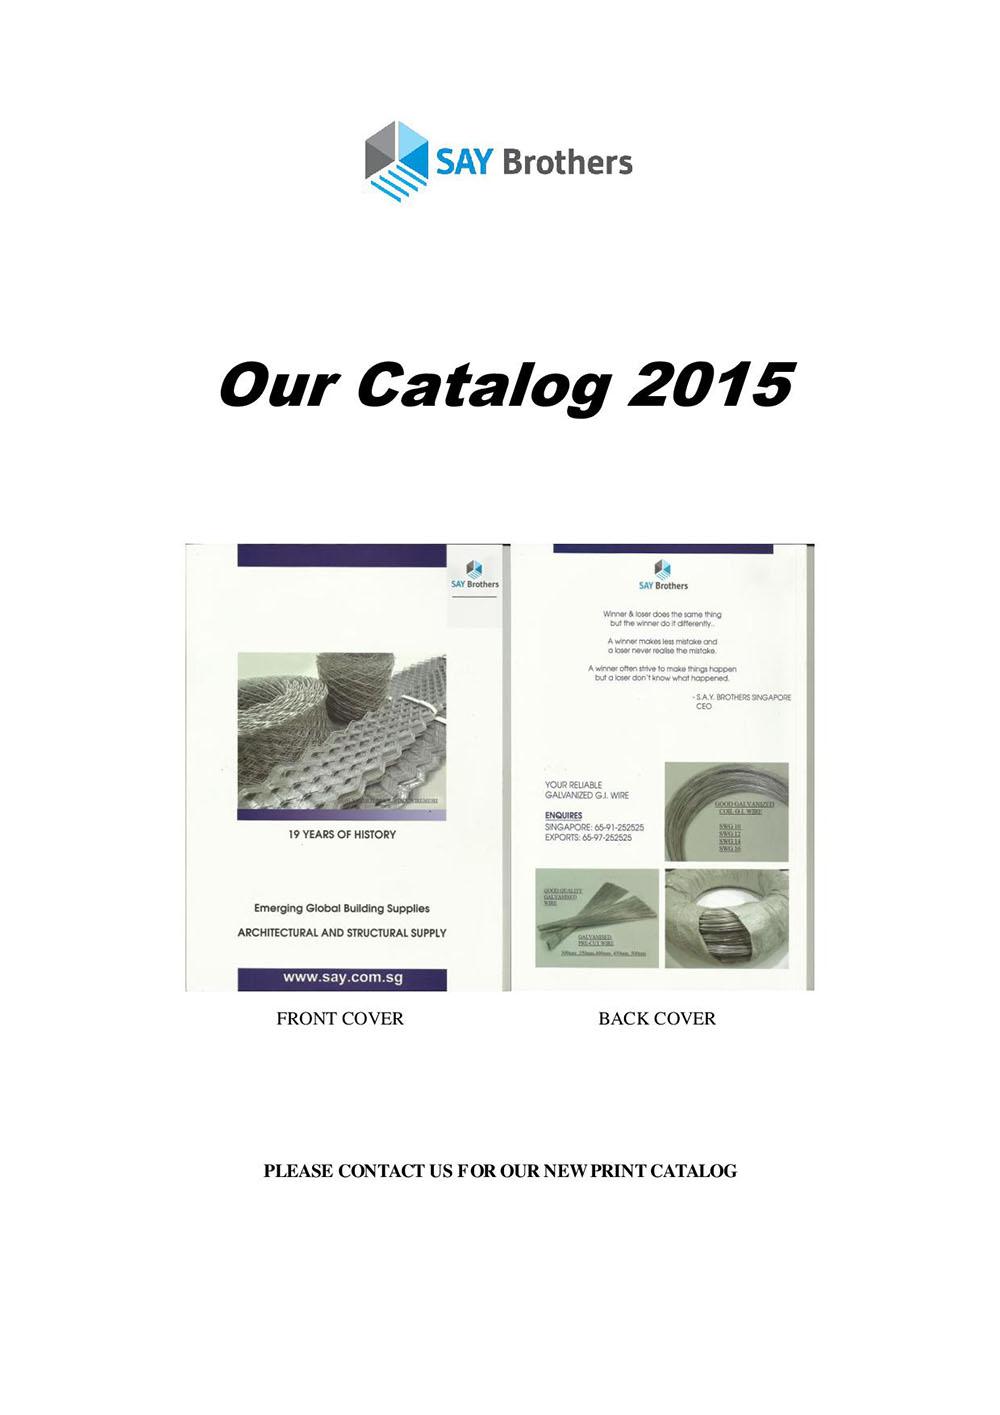 Catalogs 2015 pic